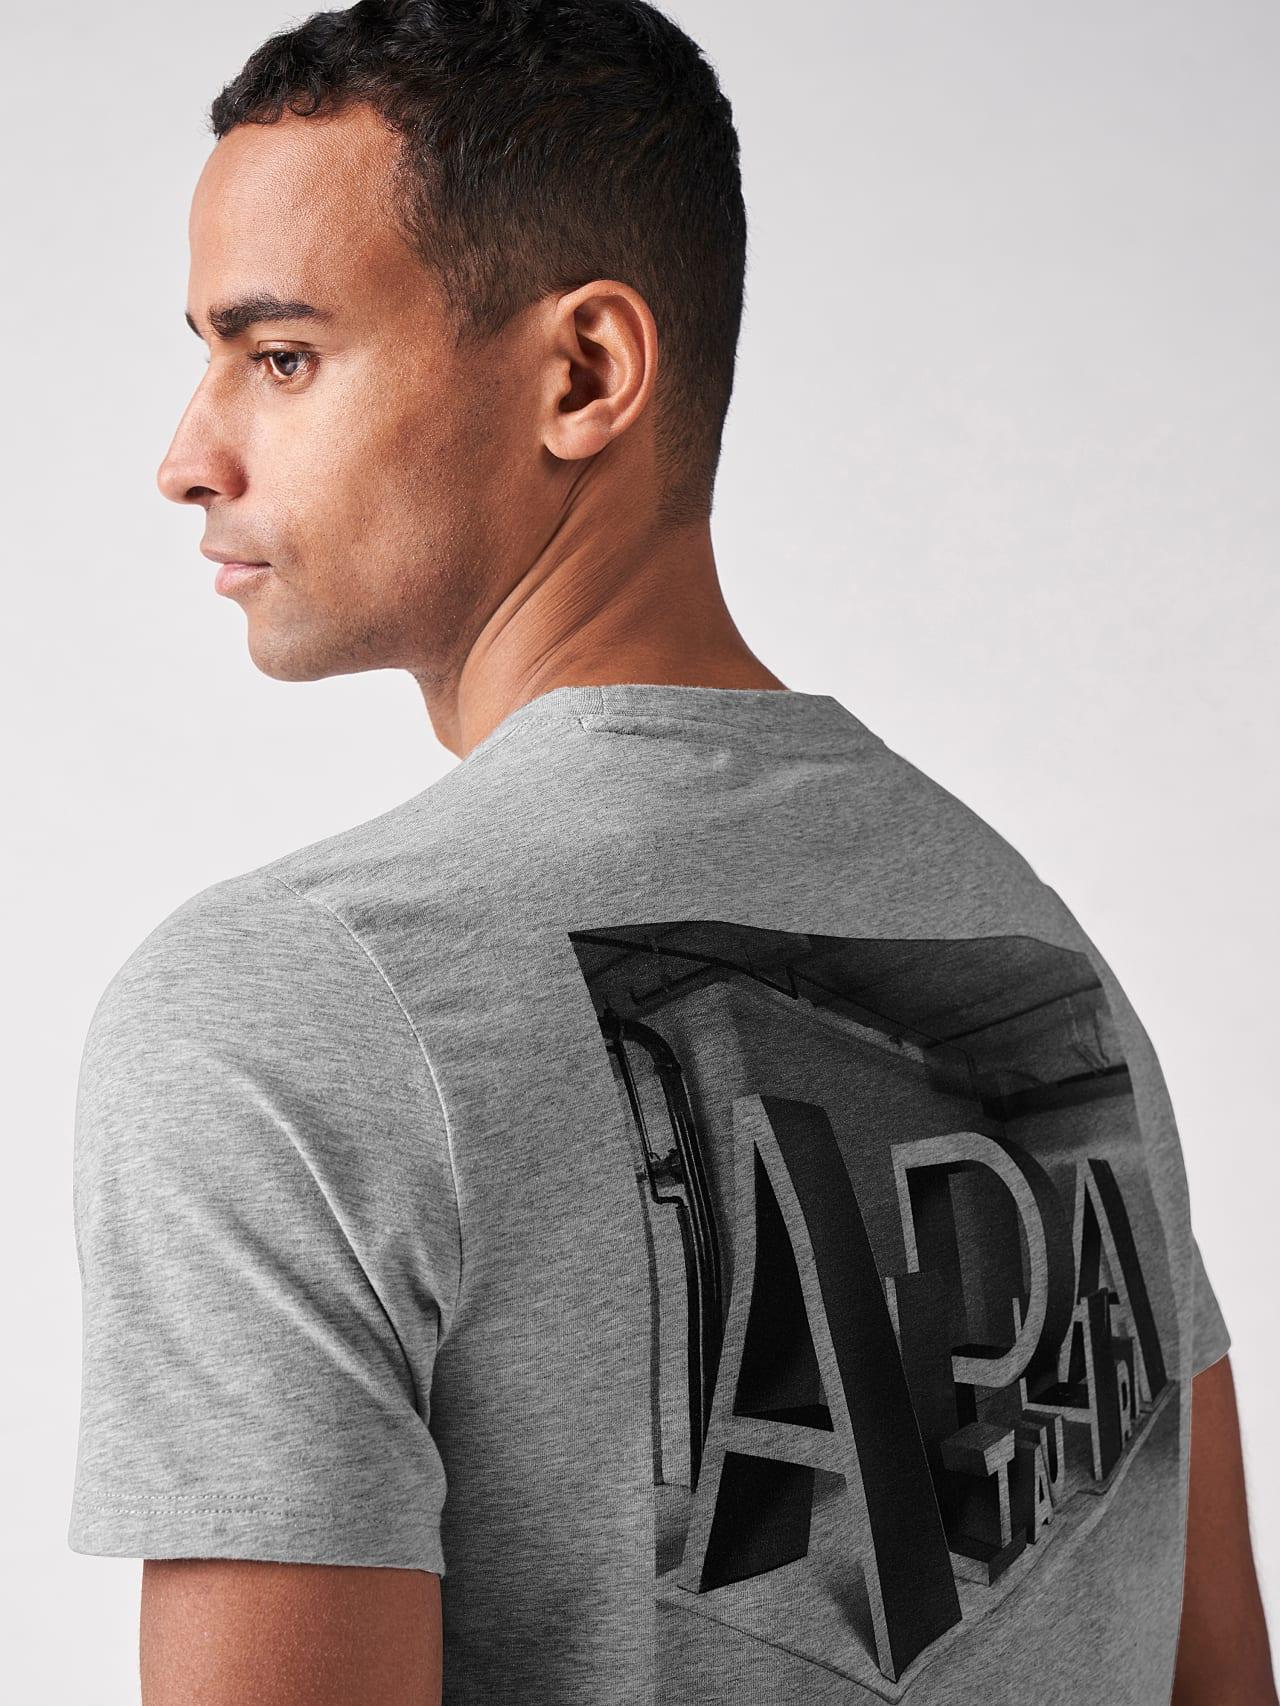 JALIP V1.Y5.01 Cotton Crew-Neck T-Shirt grey / melange Right Alpha Tauri